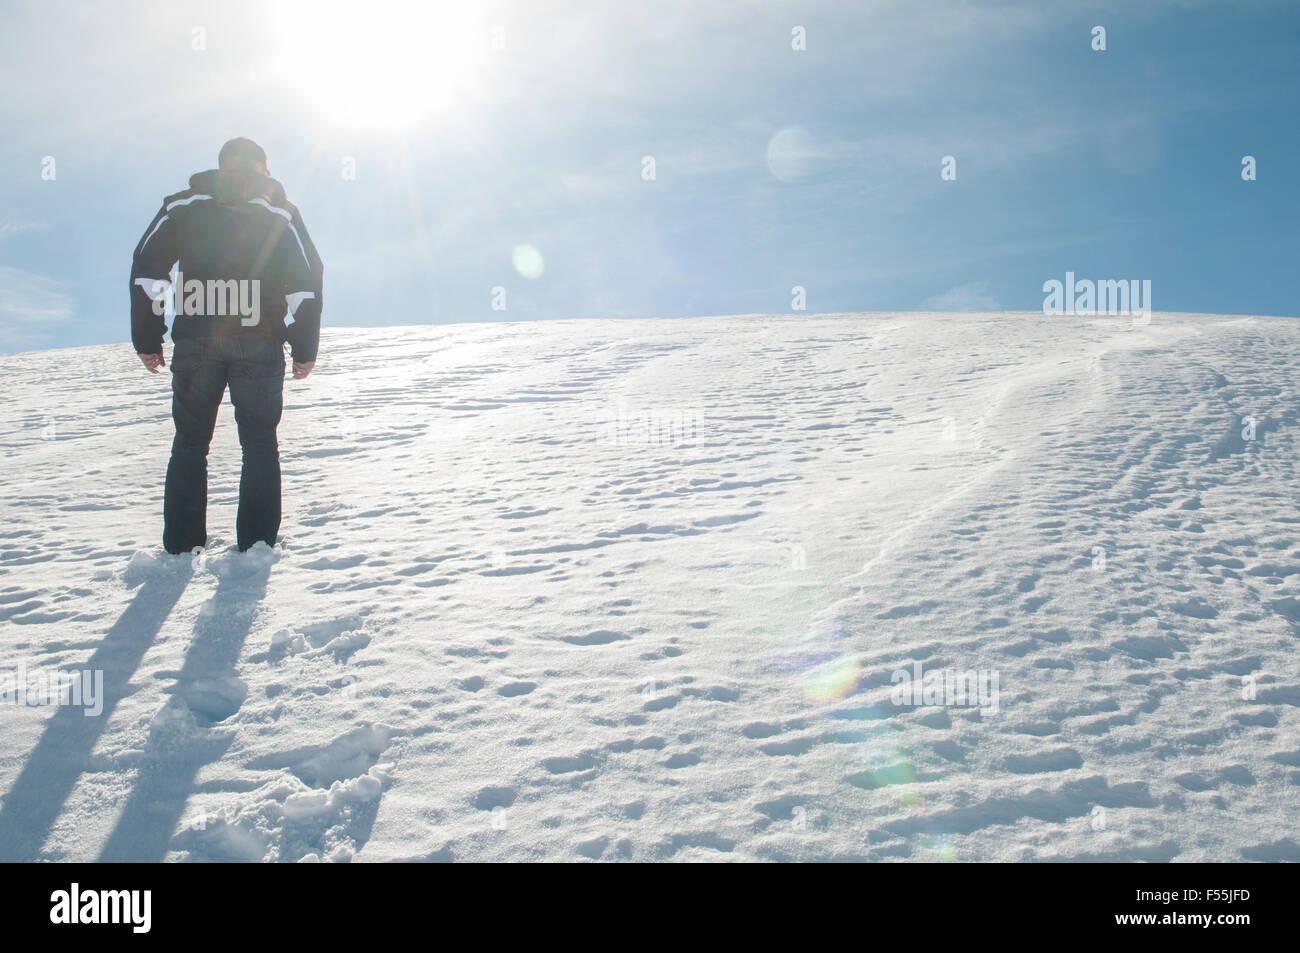 Mann zu Fuß auf einen Berg schneebedeckt Faraya Kesrouan Libanon Nahost Stockbild